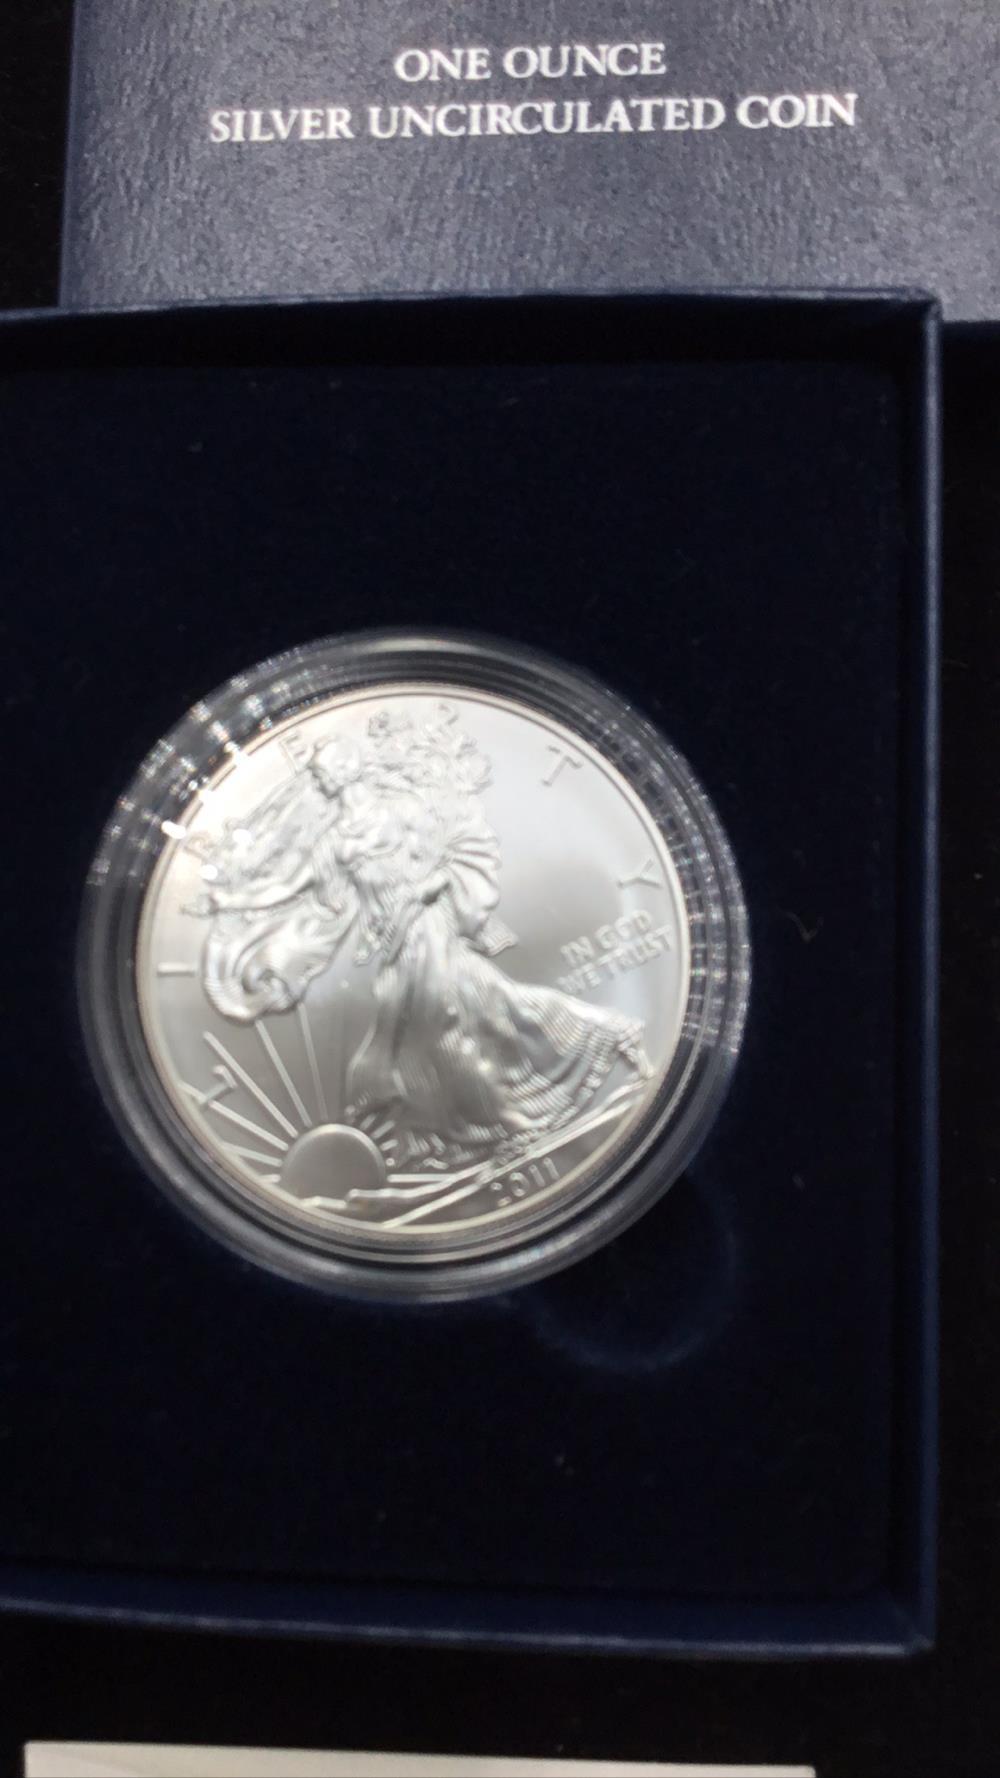 Lot 50: American eagle 1 ounce silver dollar uncirculated